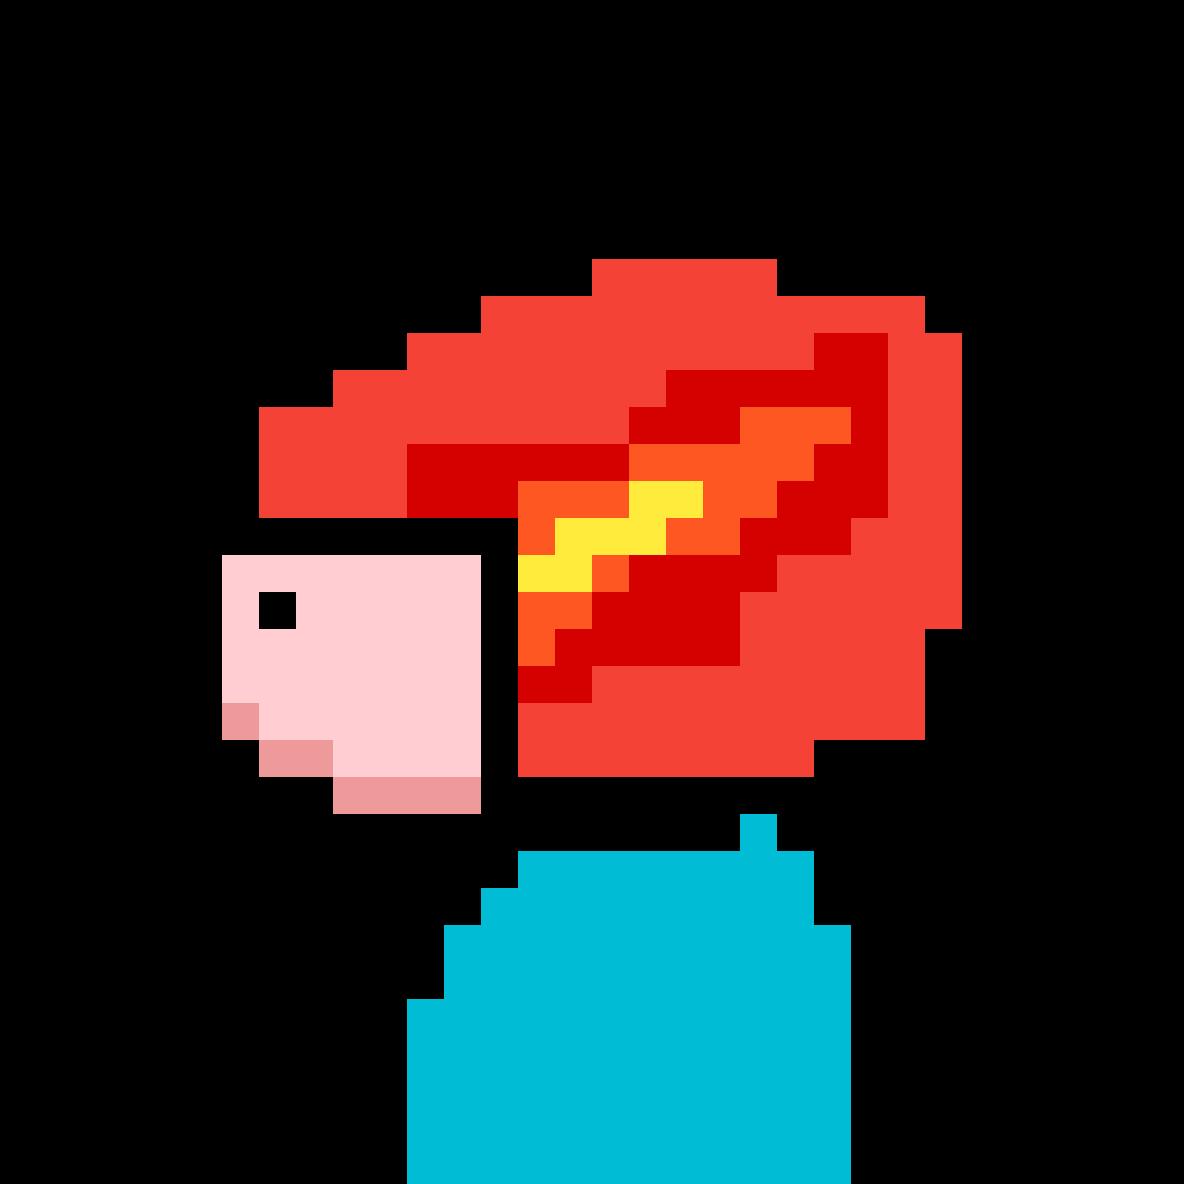 Bikey boi by GameTinkerer